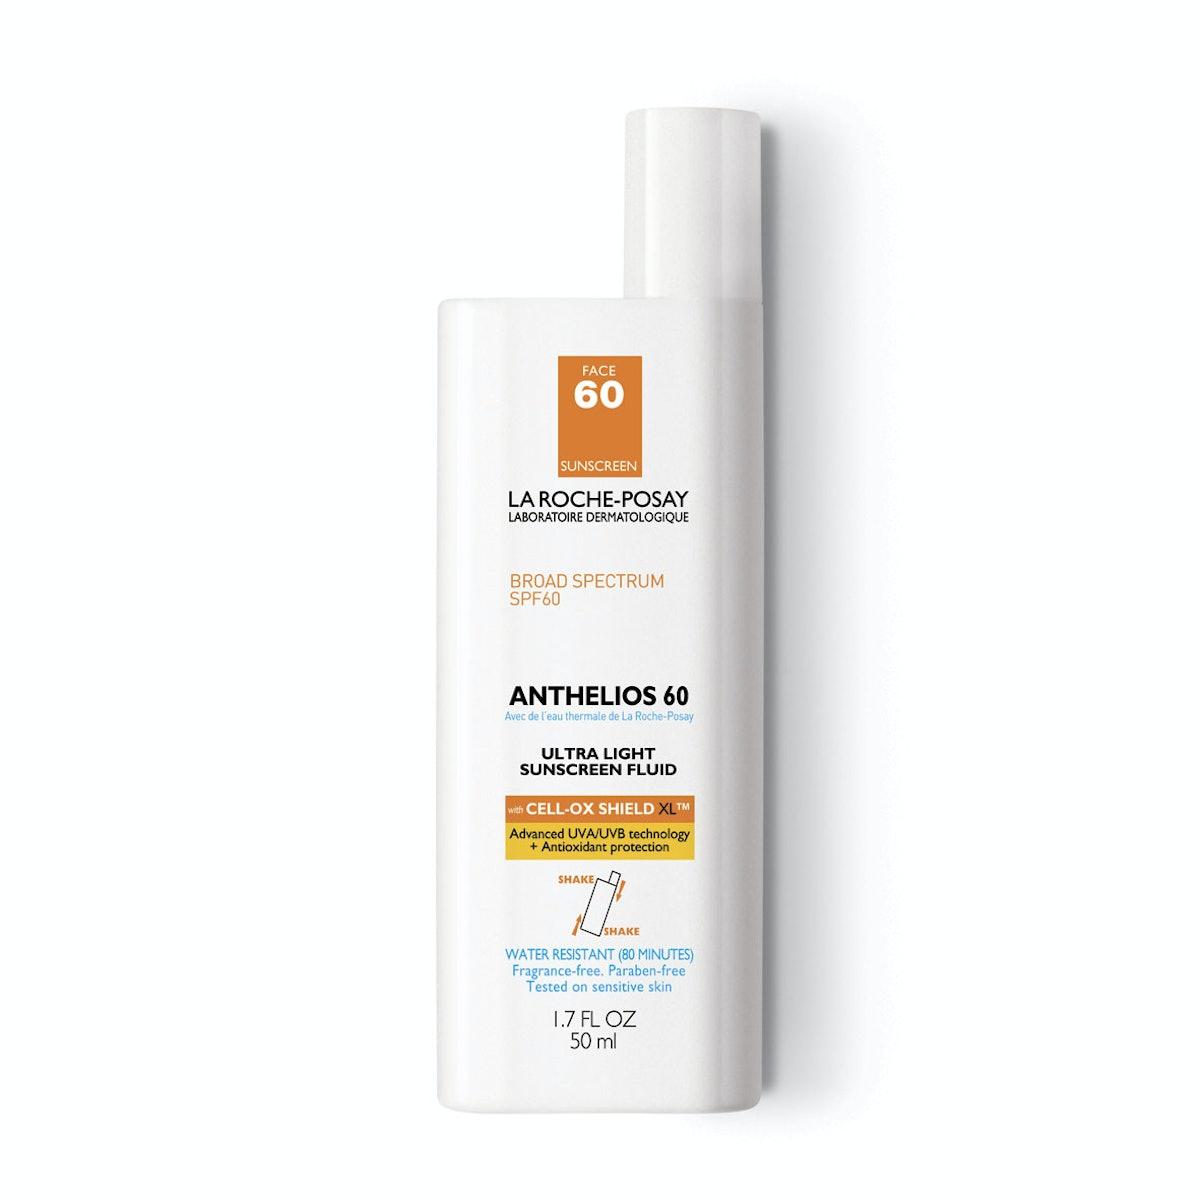 La Roche-Posay Anthelios 60 Ultra-Light Sunscreen